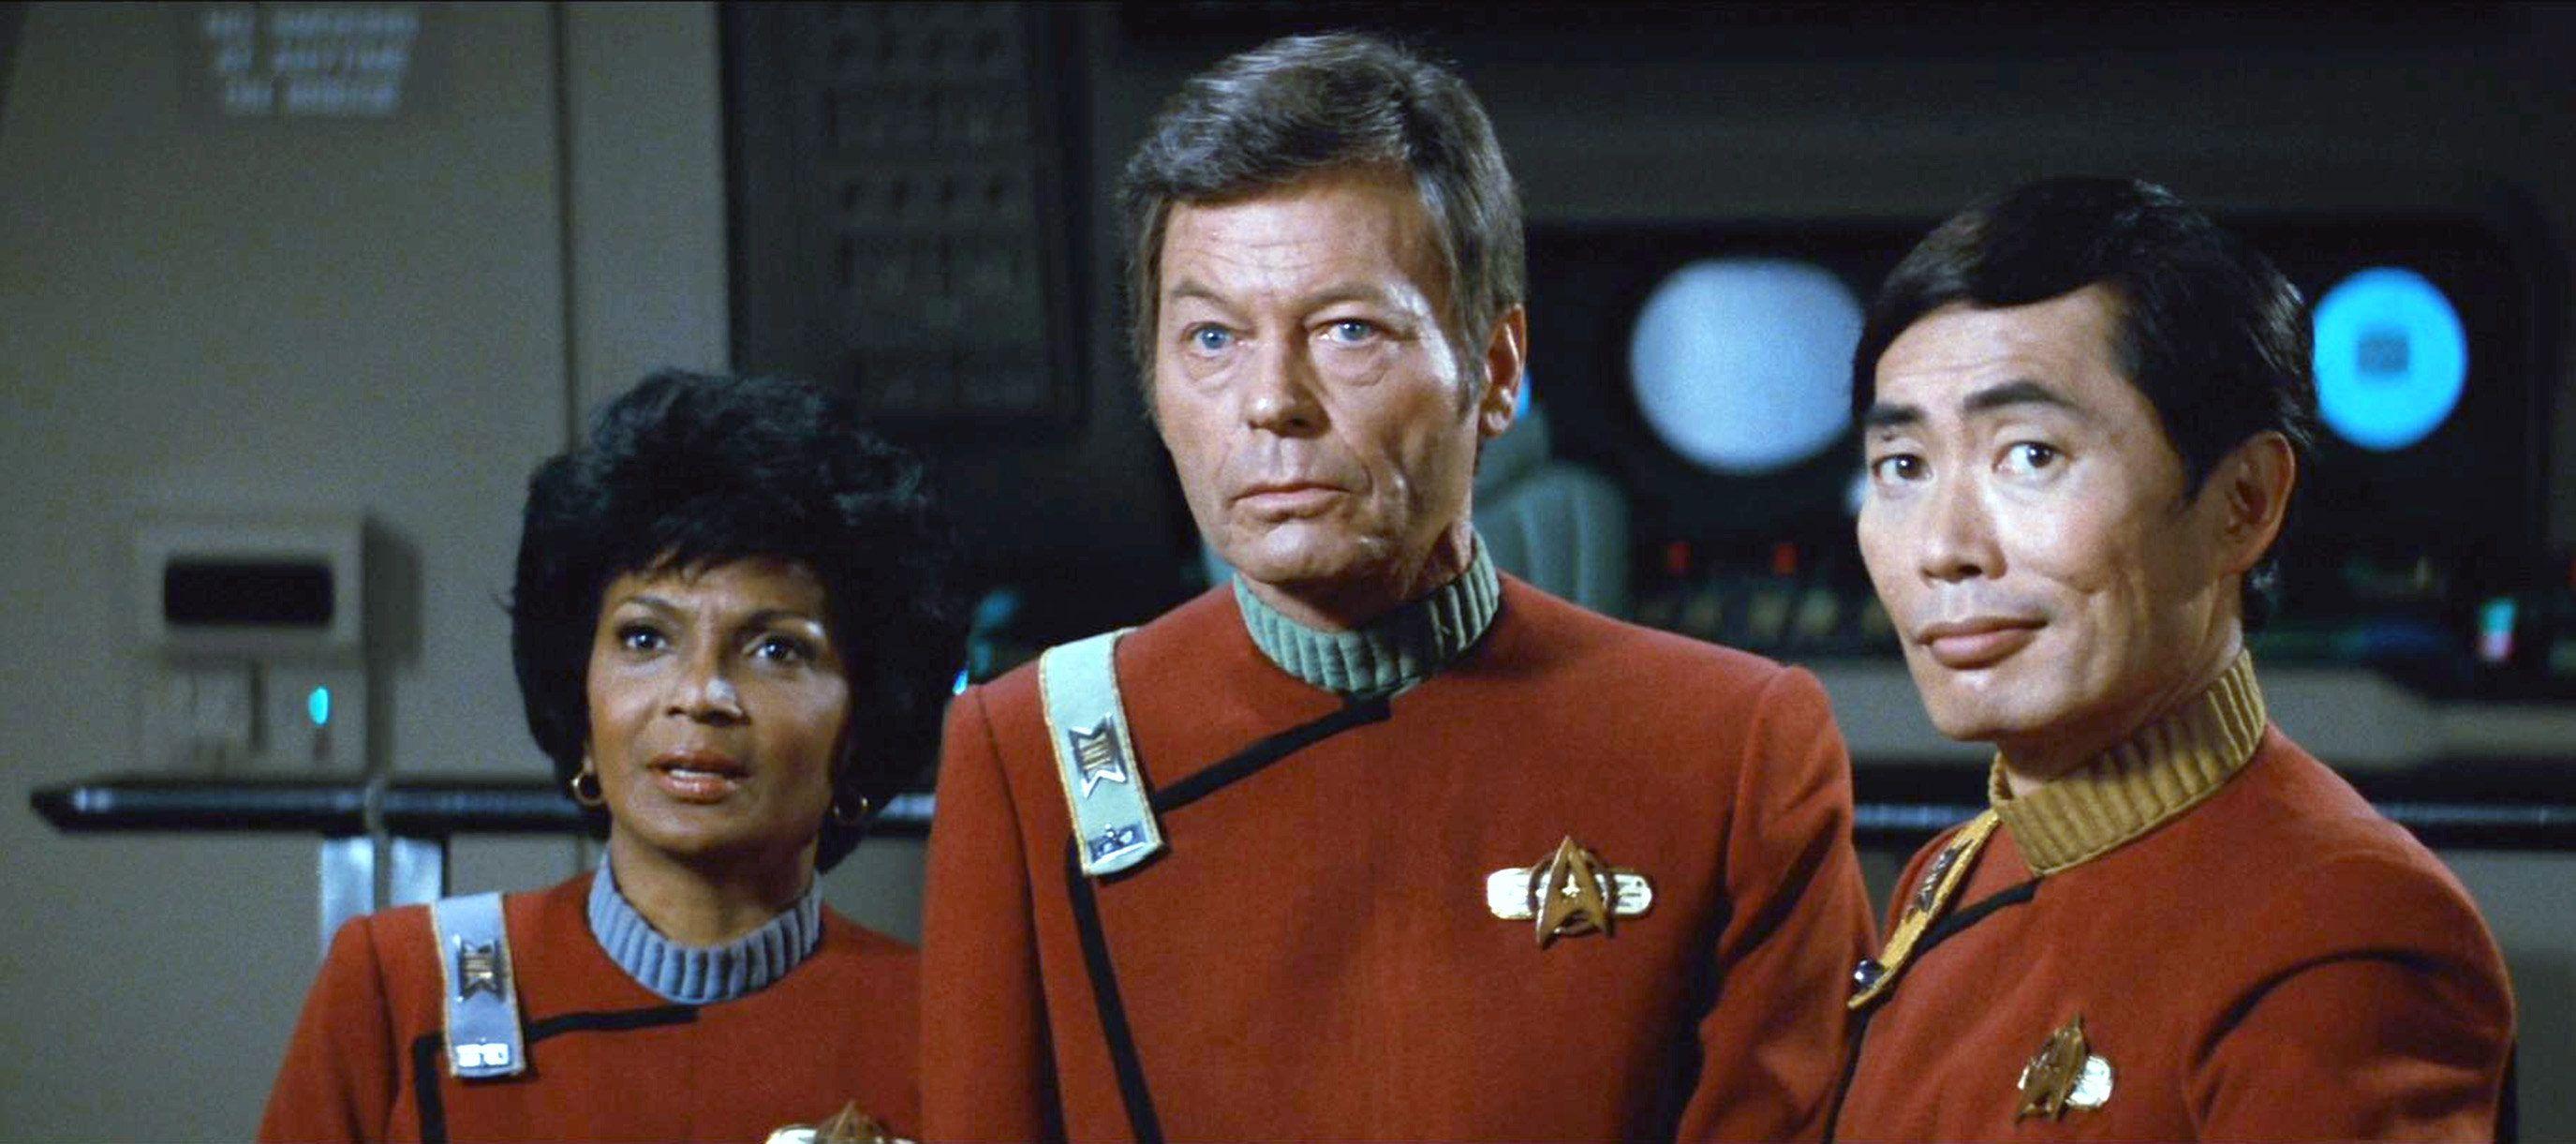 Uhura McCoy and Sulu in Star Trek